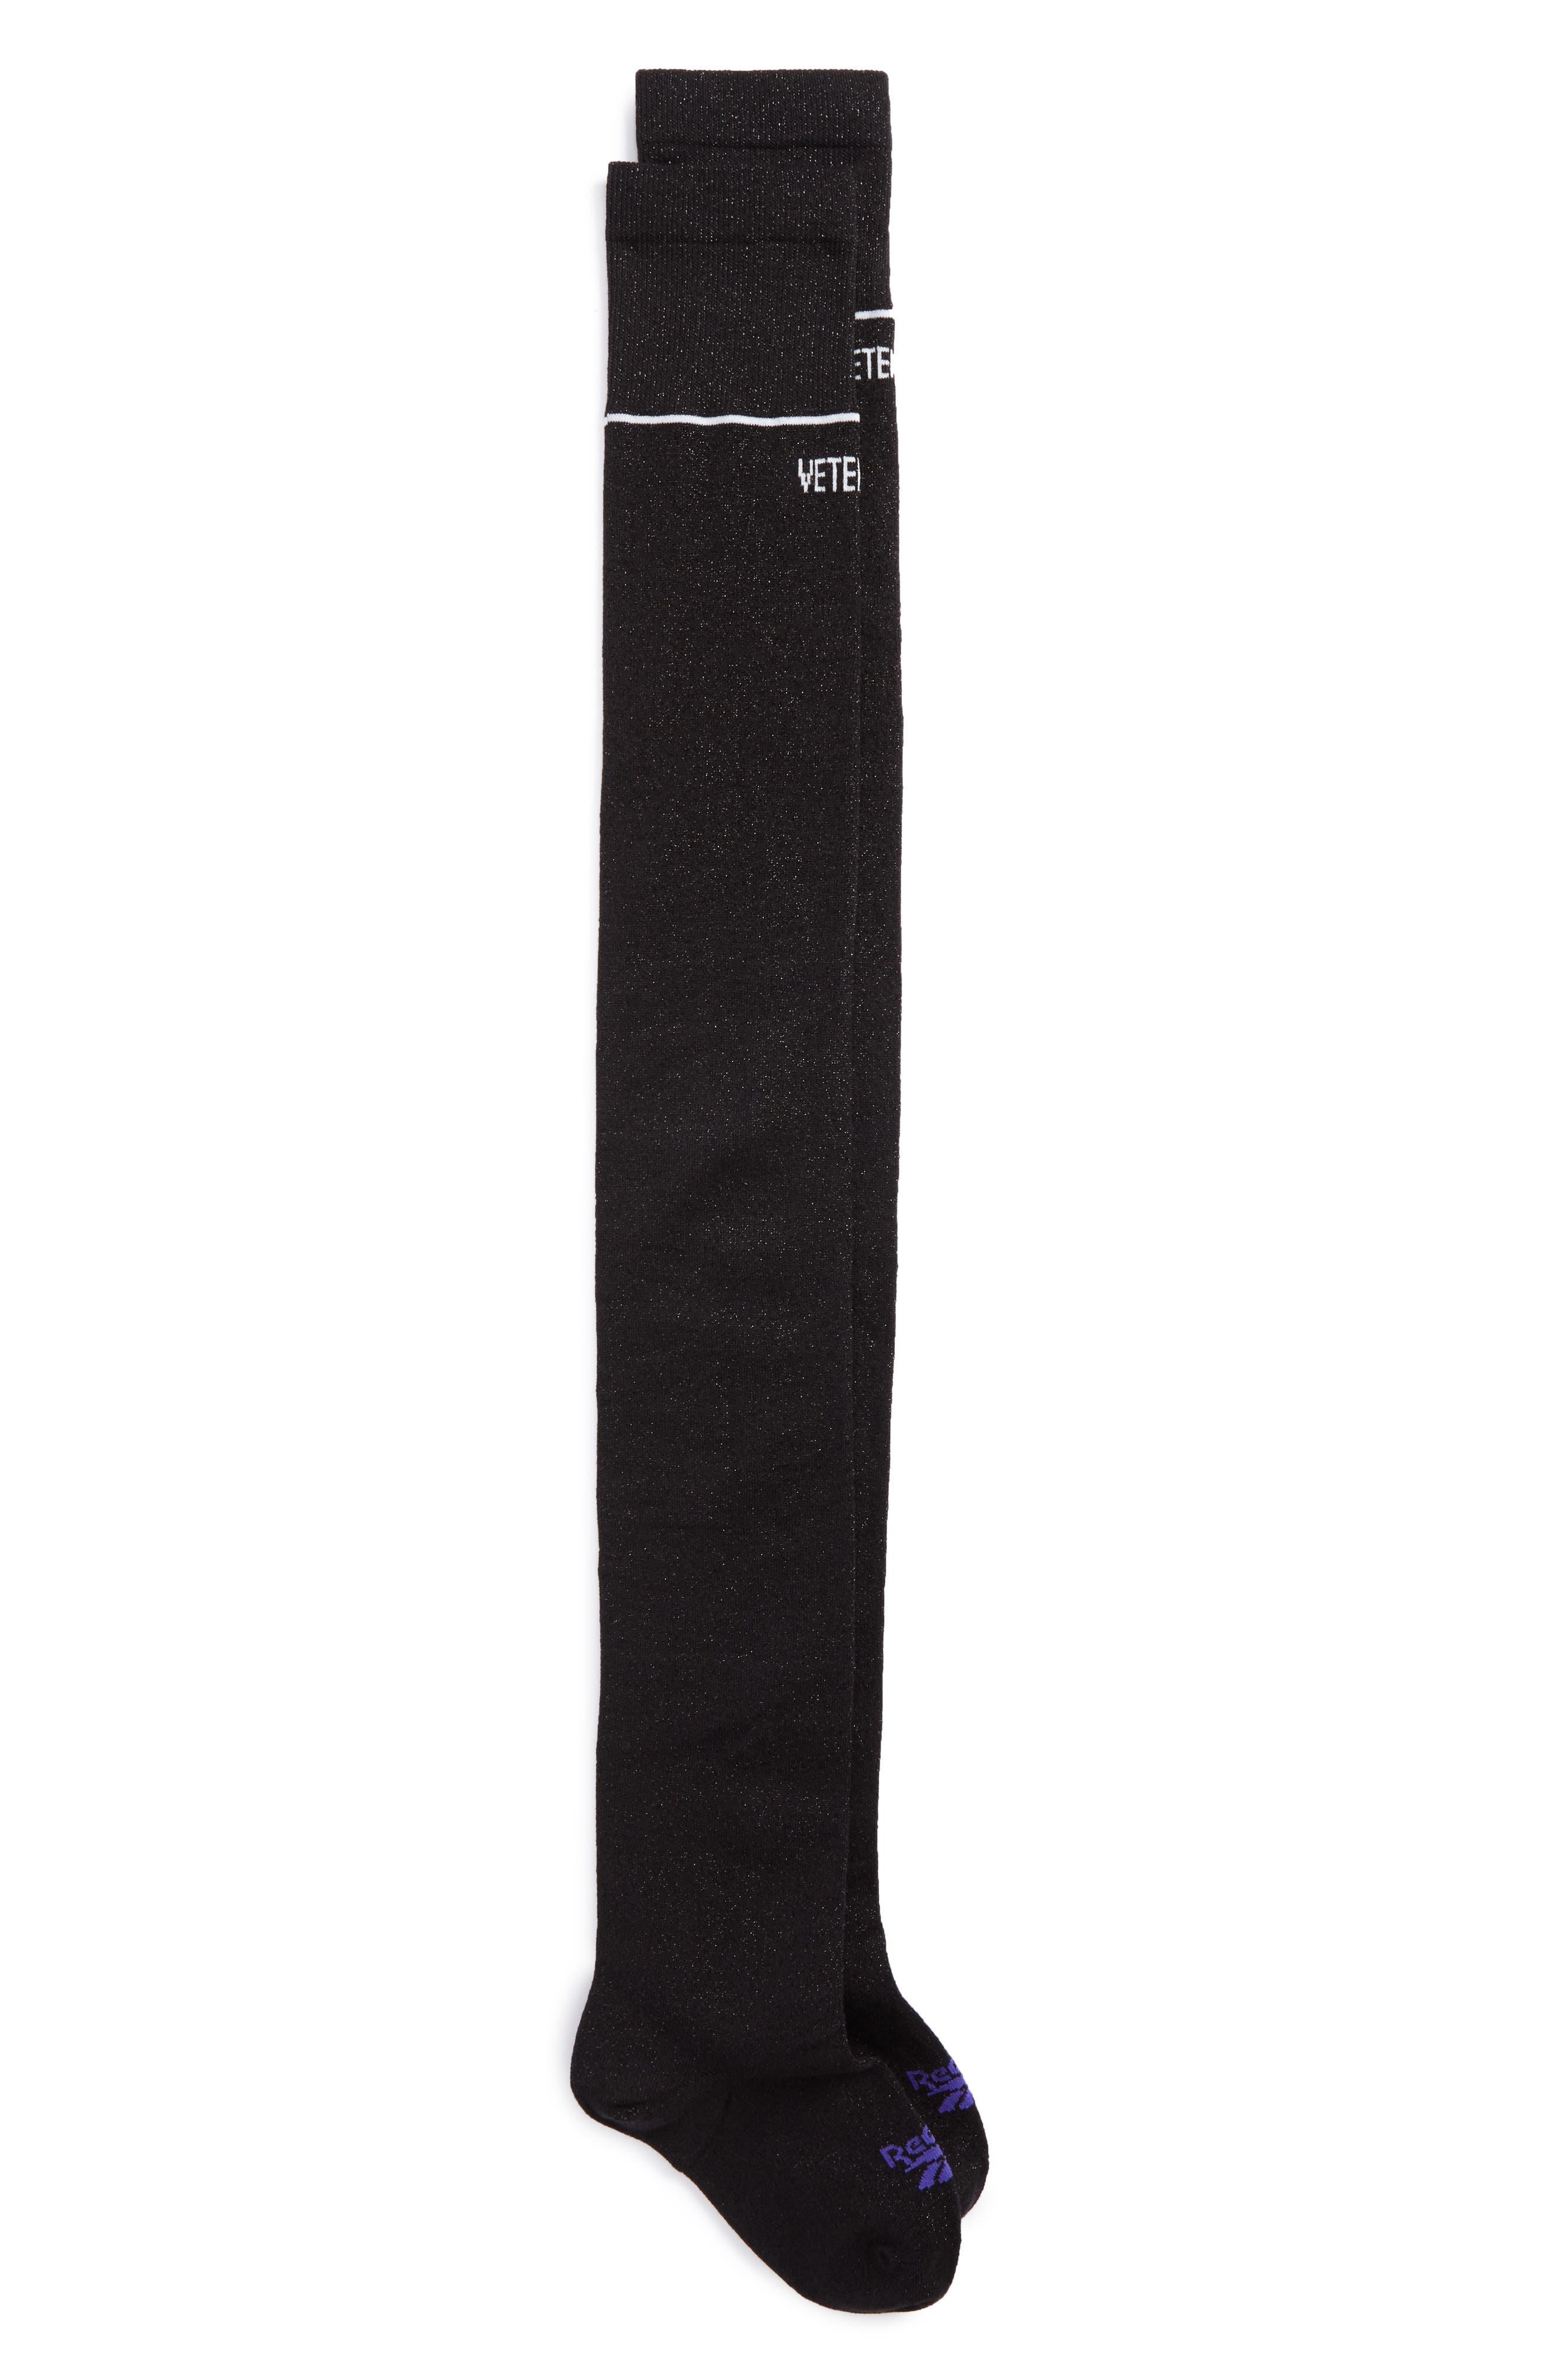 Main Image - Vetements Cuissardes Knee Socks